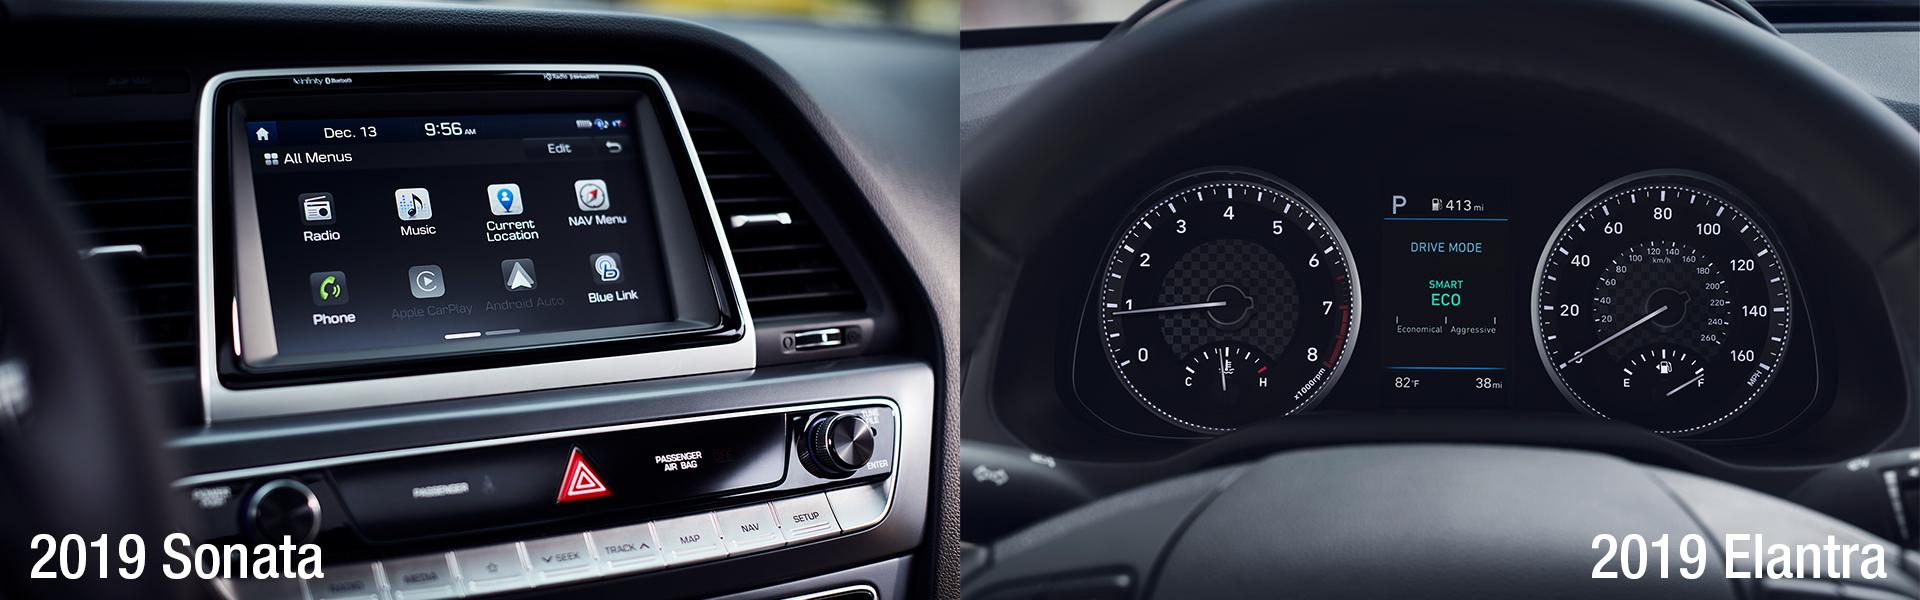 The 2019 Hyundai Sonata and the 2019 Hyundai Elantra